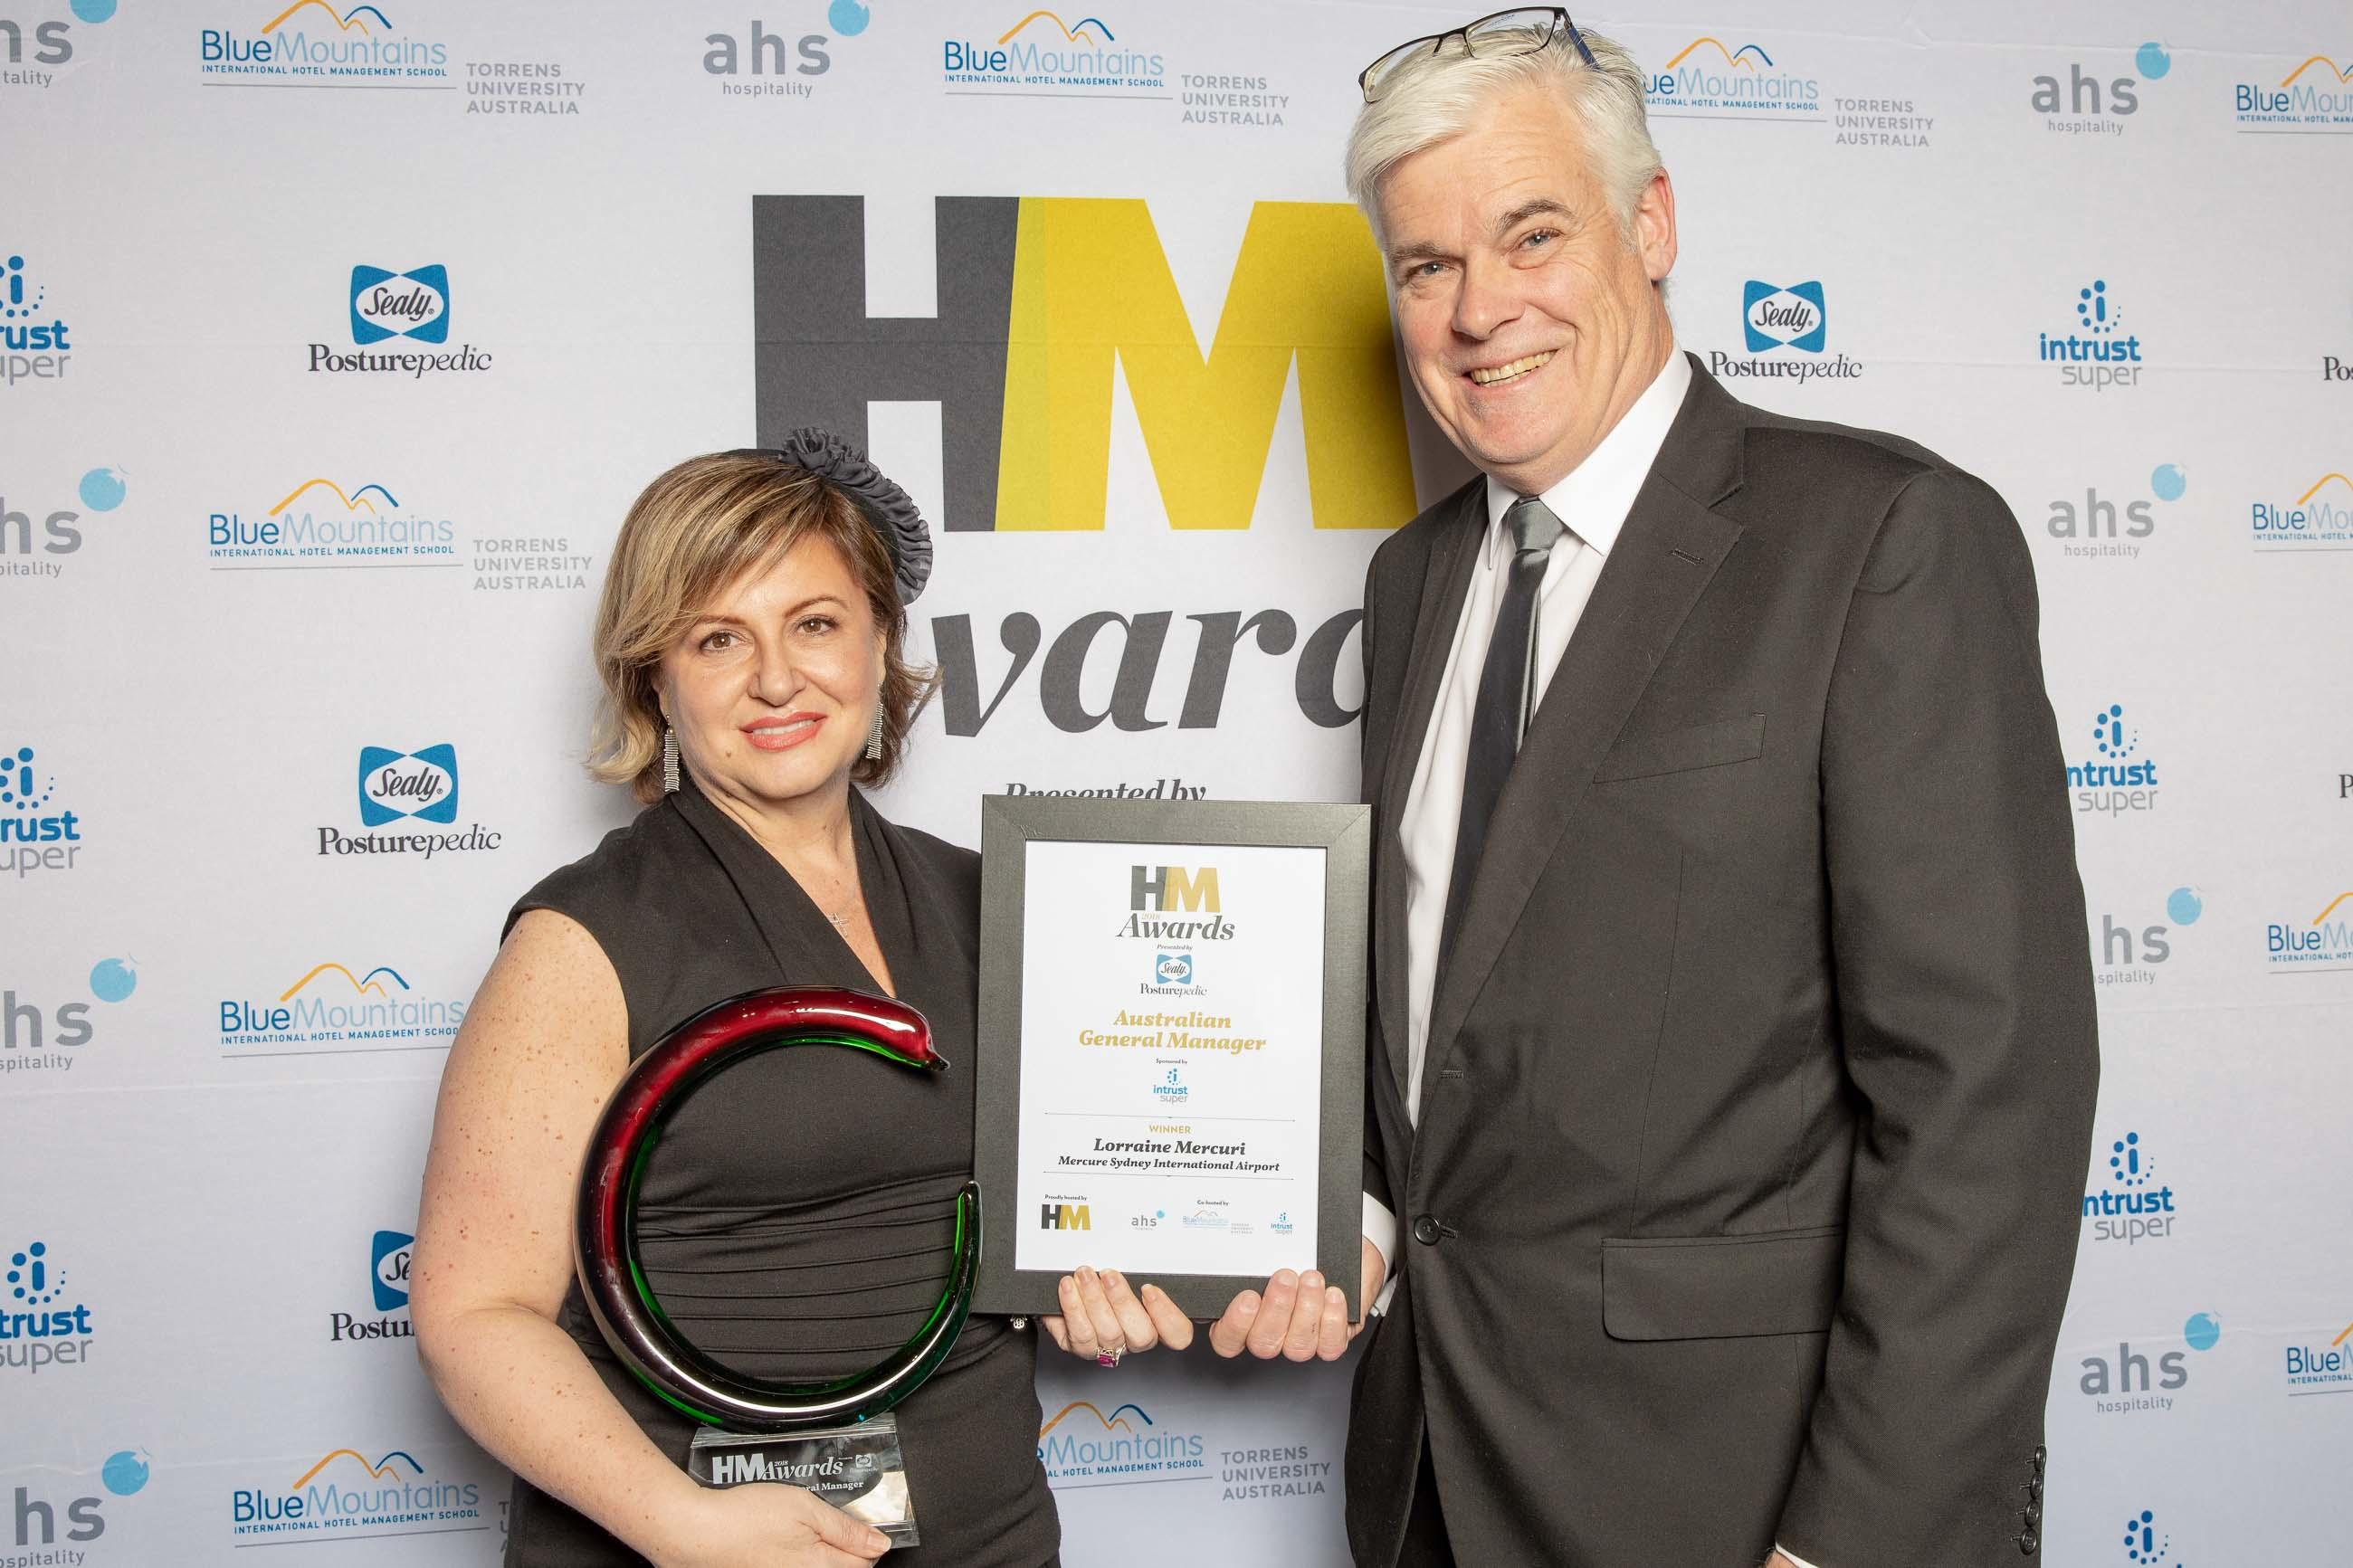 72ppi-HMawards-2018-official-award-wall-248248